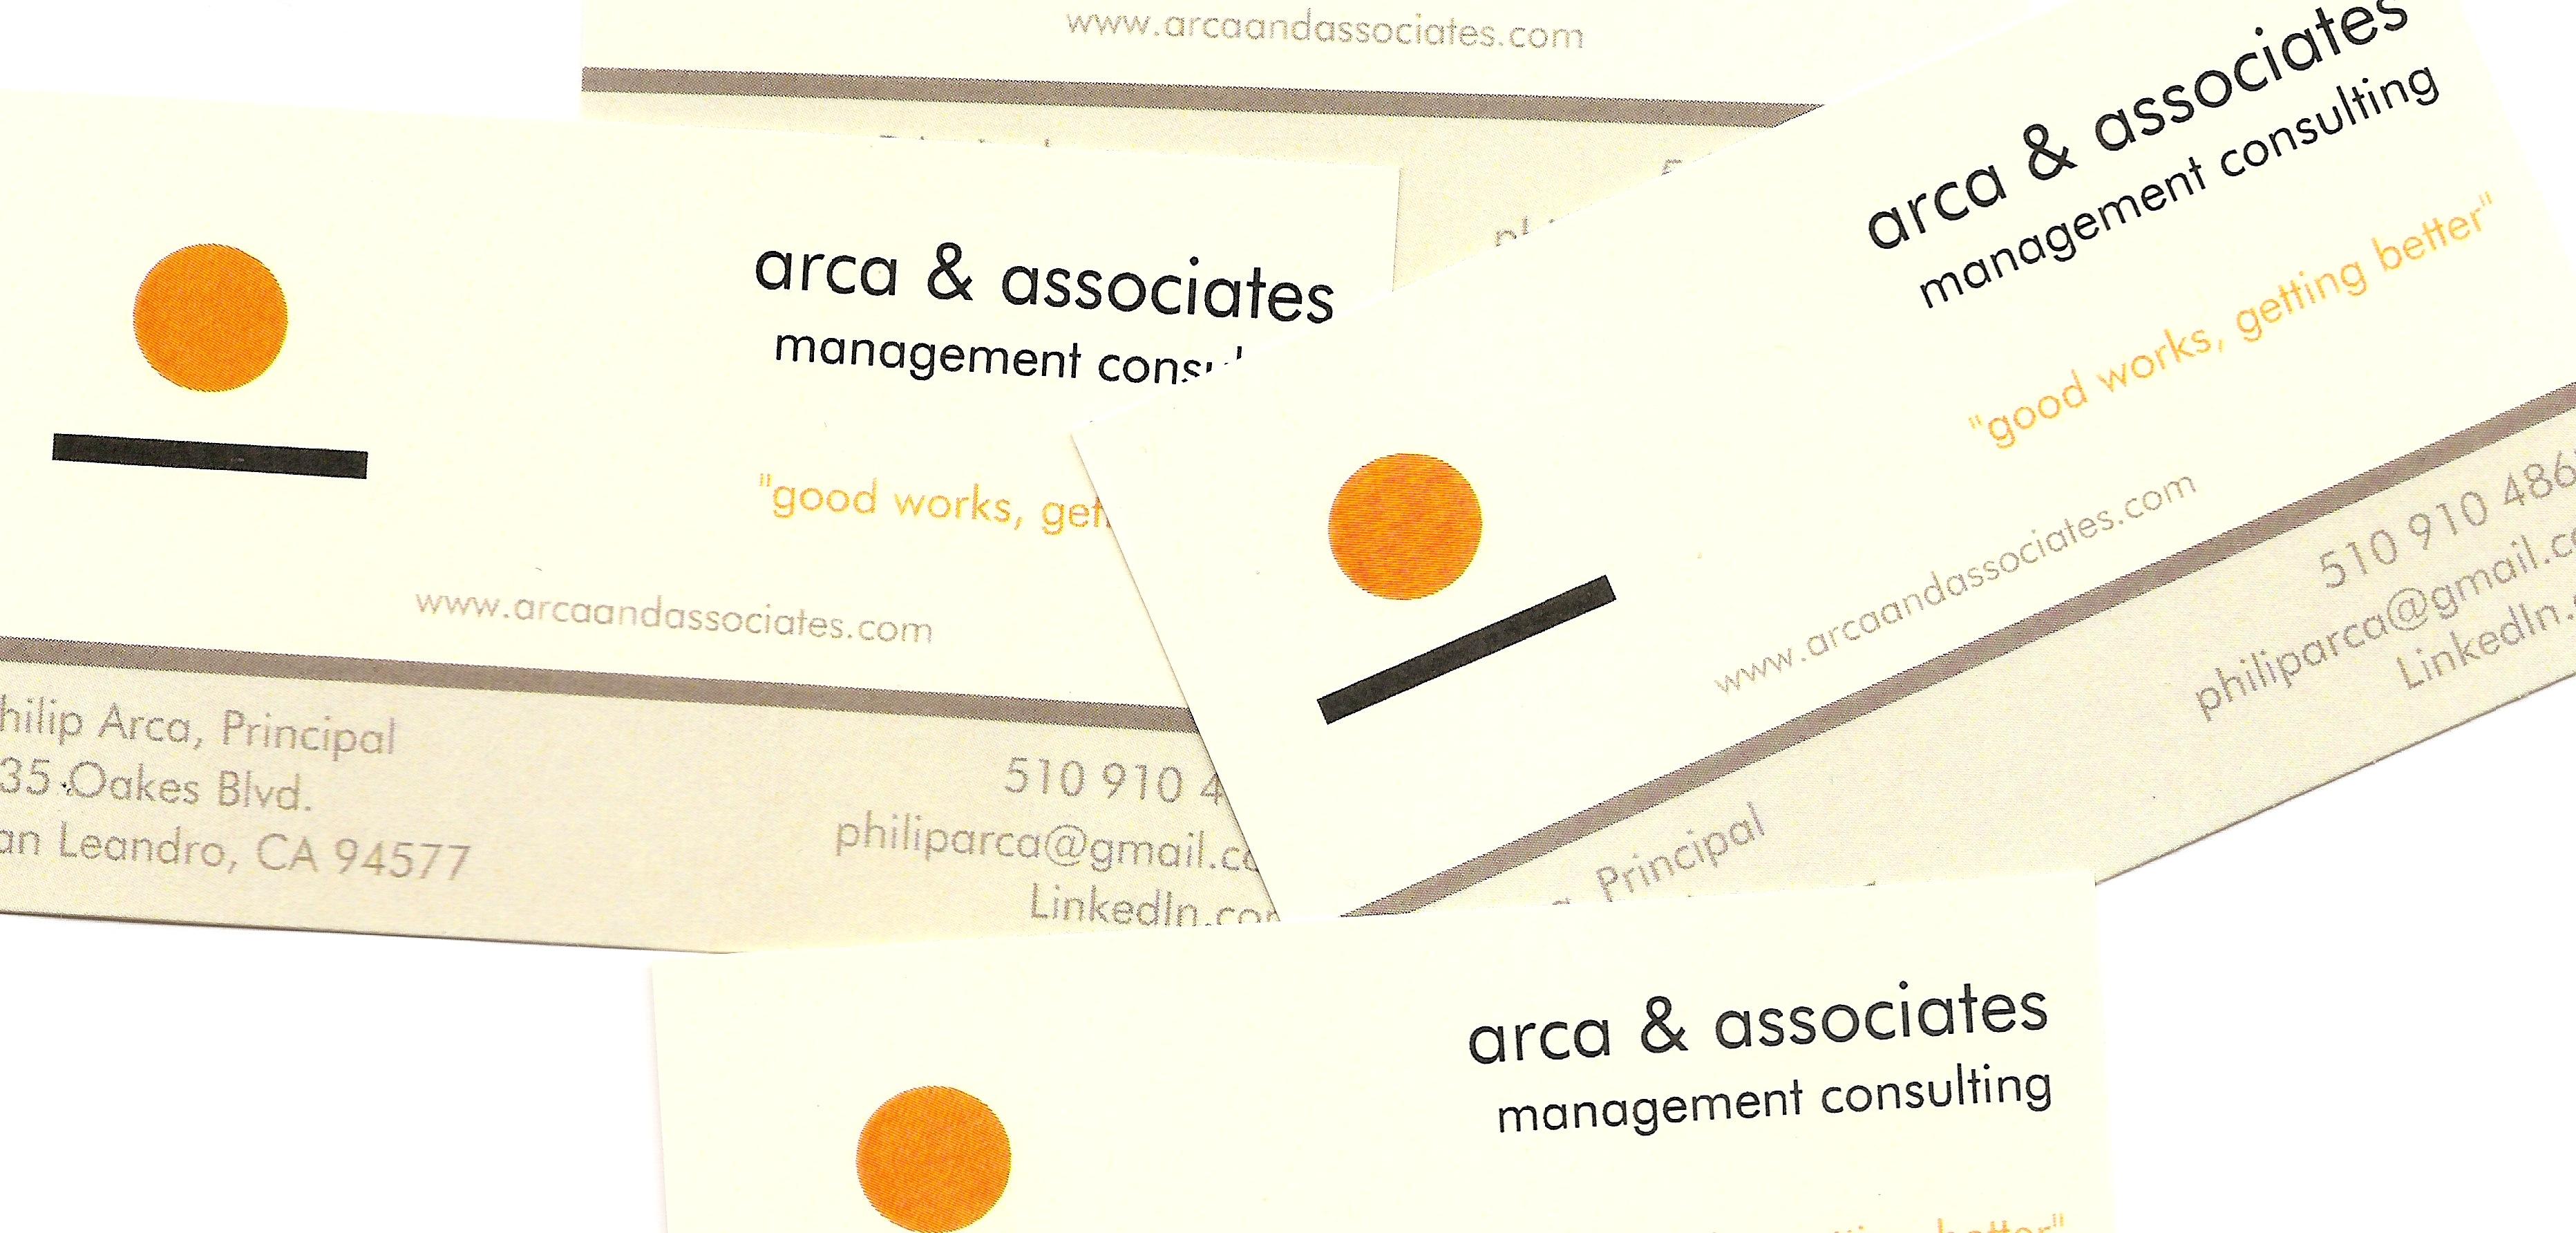 arca & associates